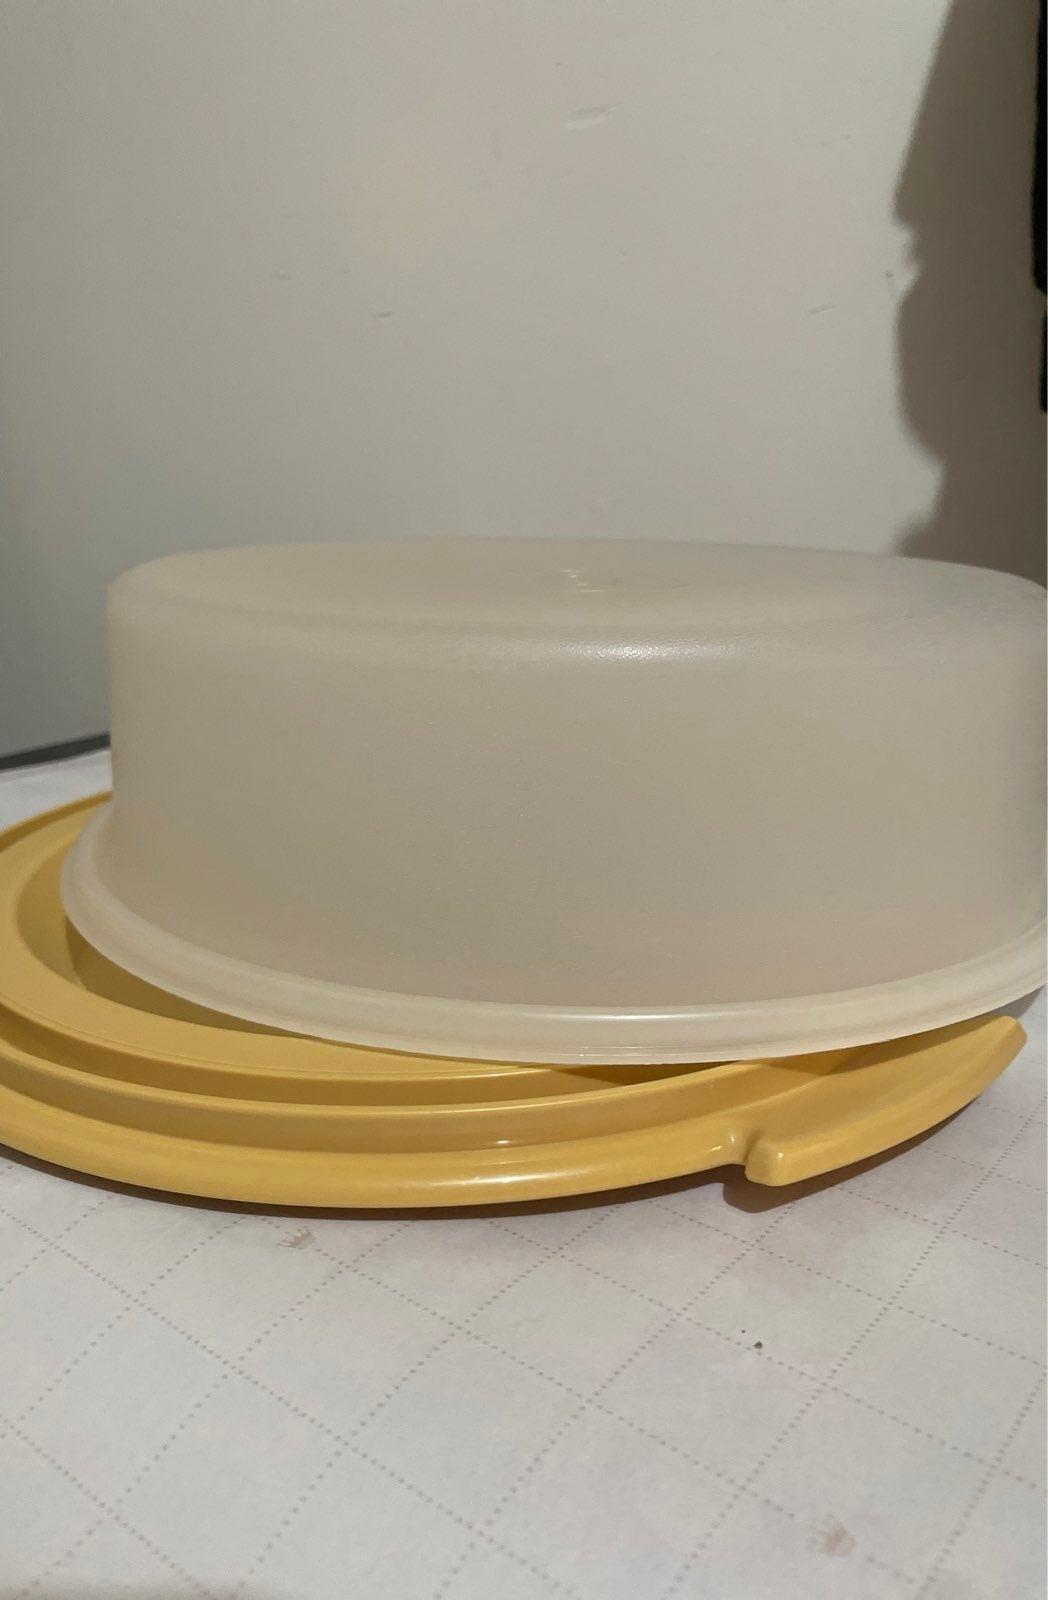 Vintage Tupperware Cake Taker #720-5